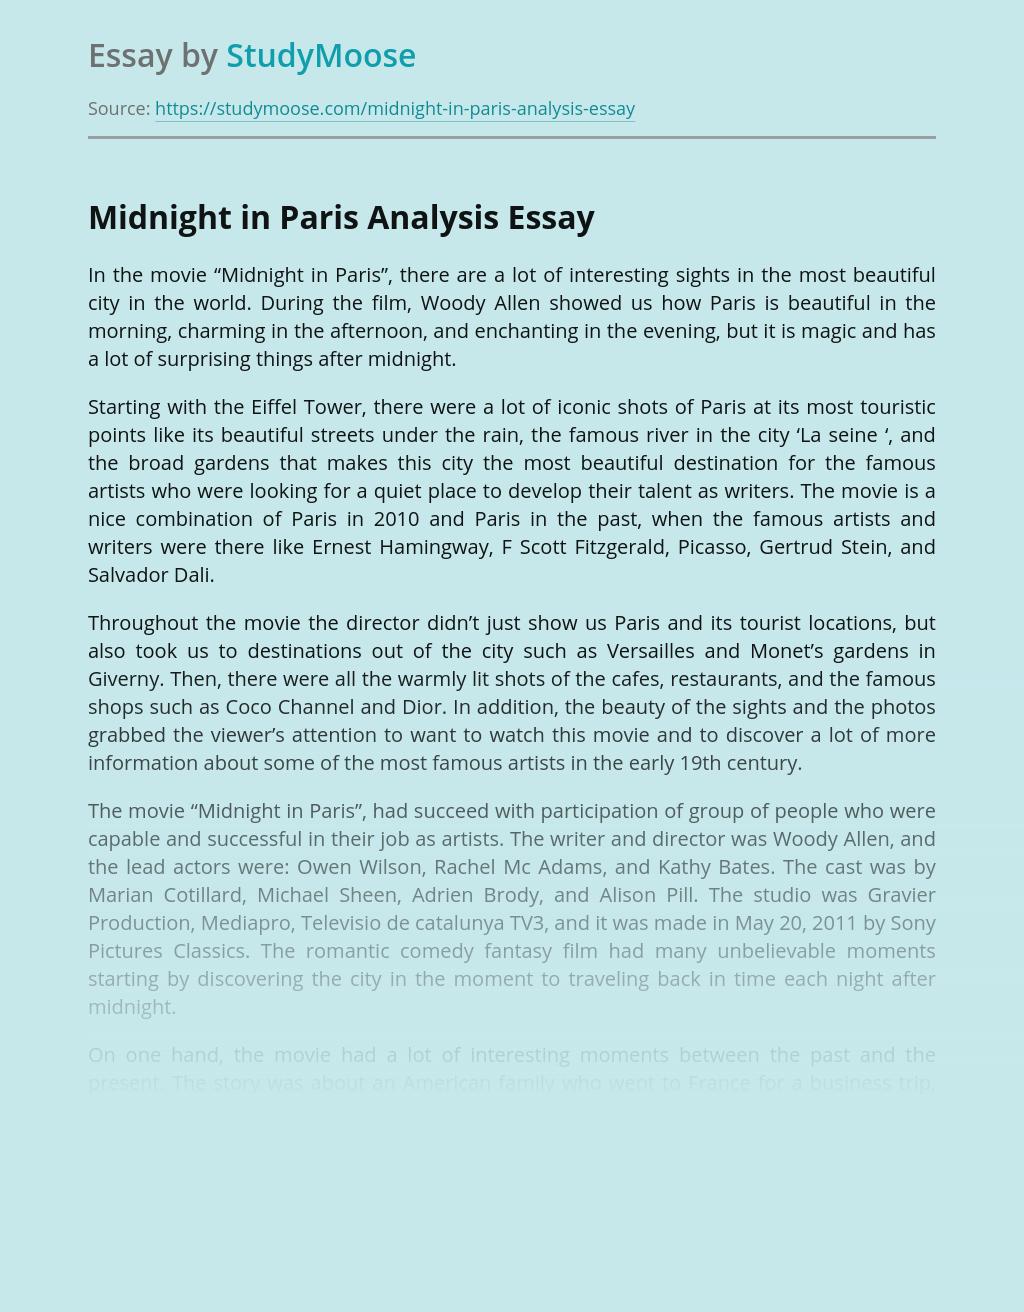 Midnight in Paris Analysis